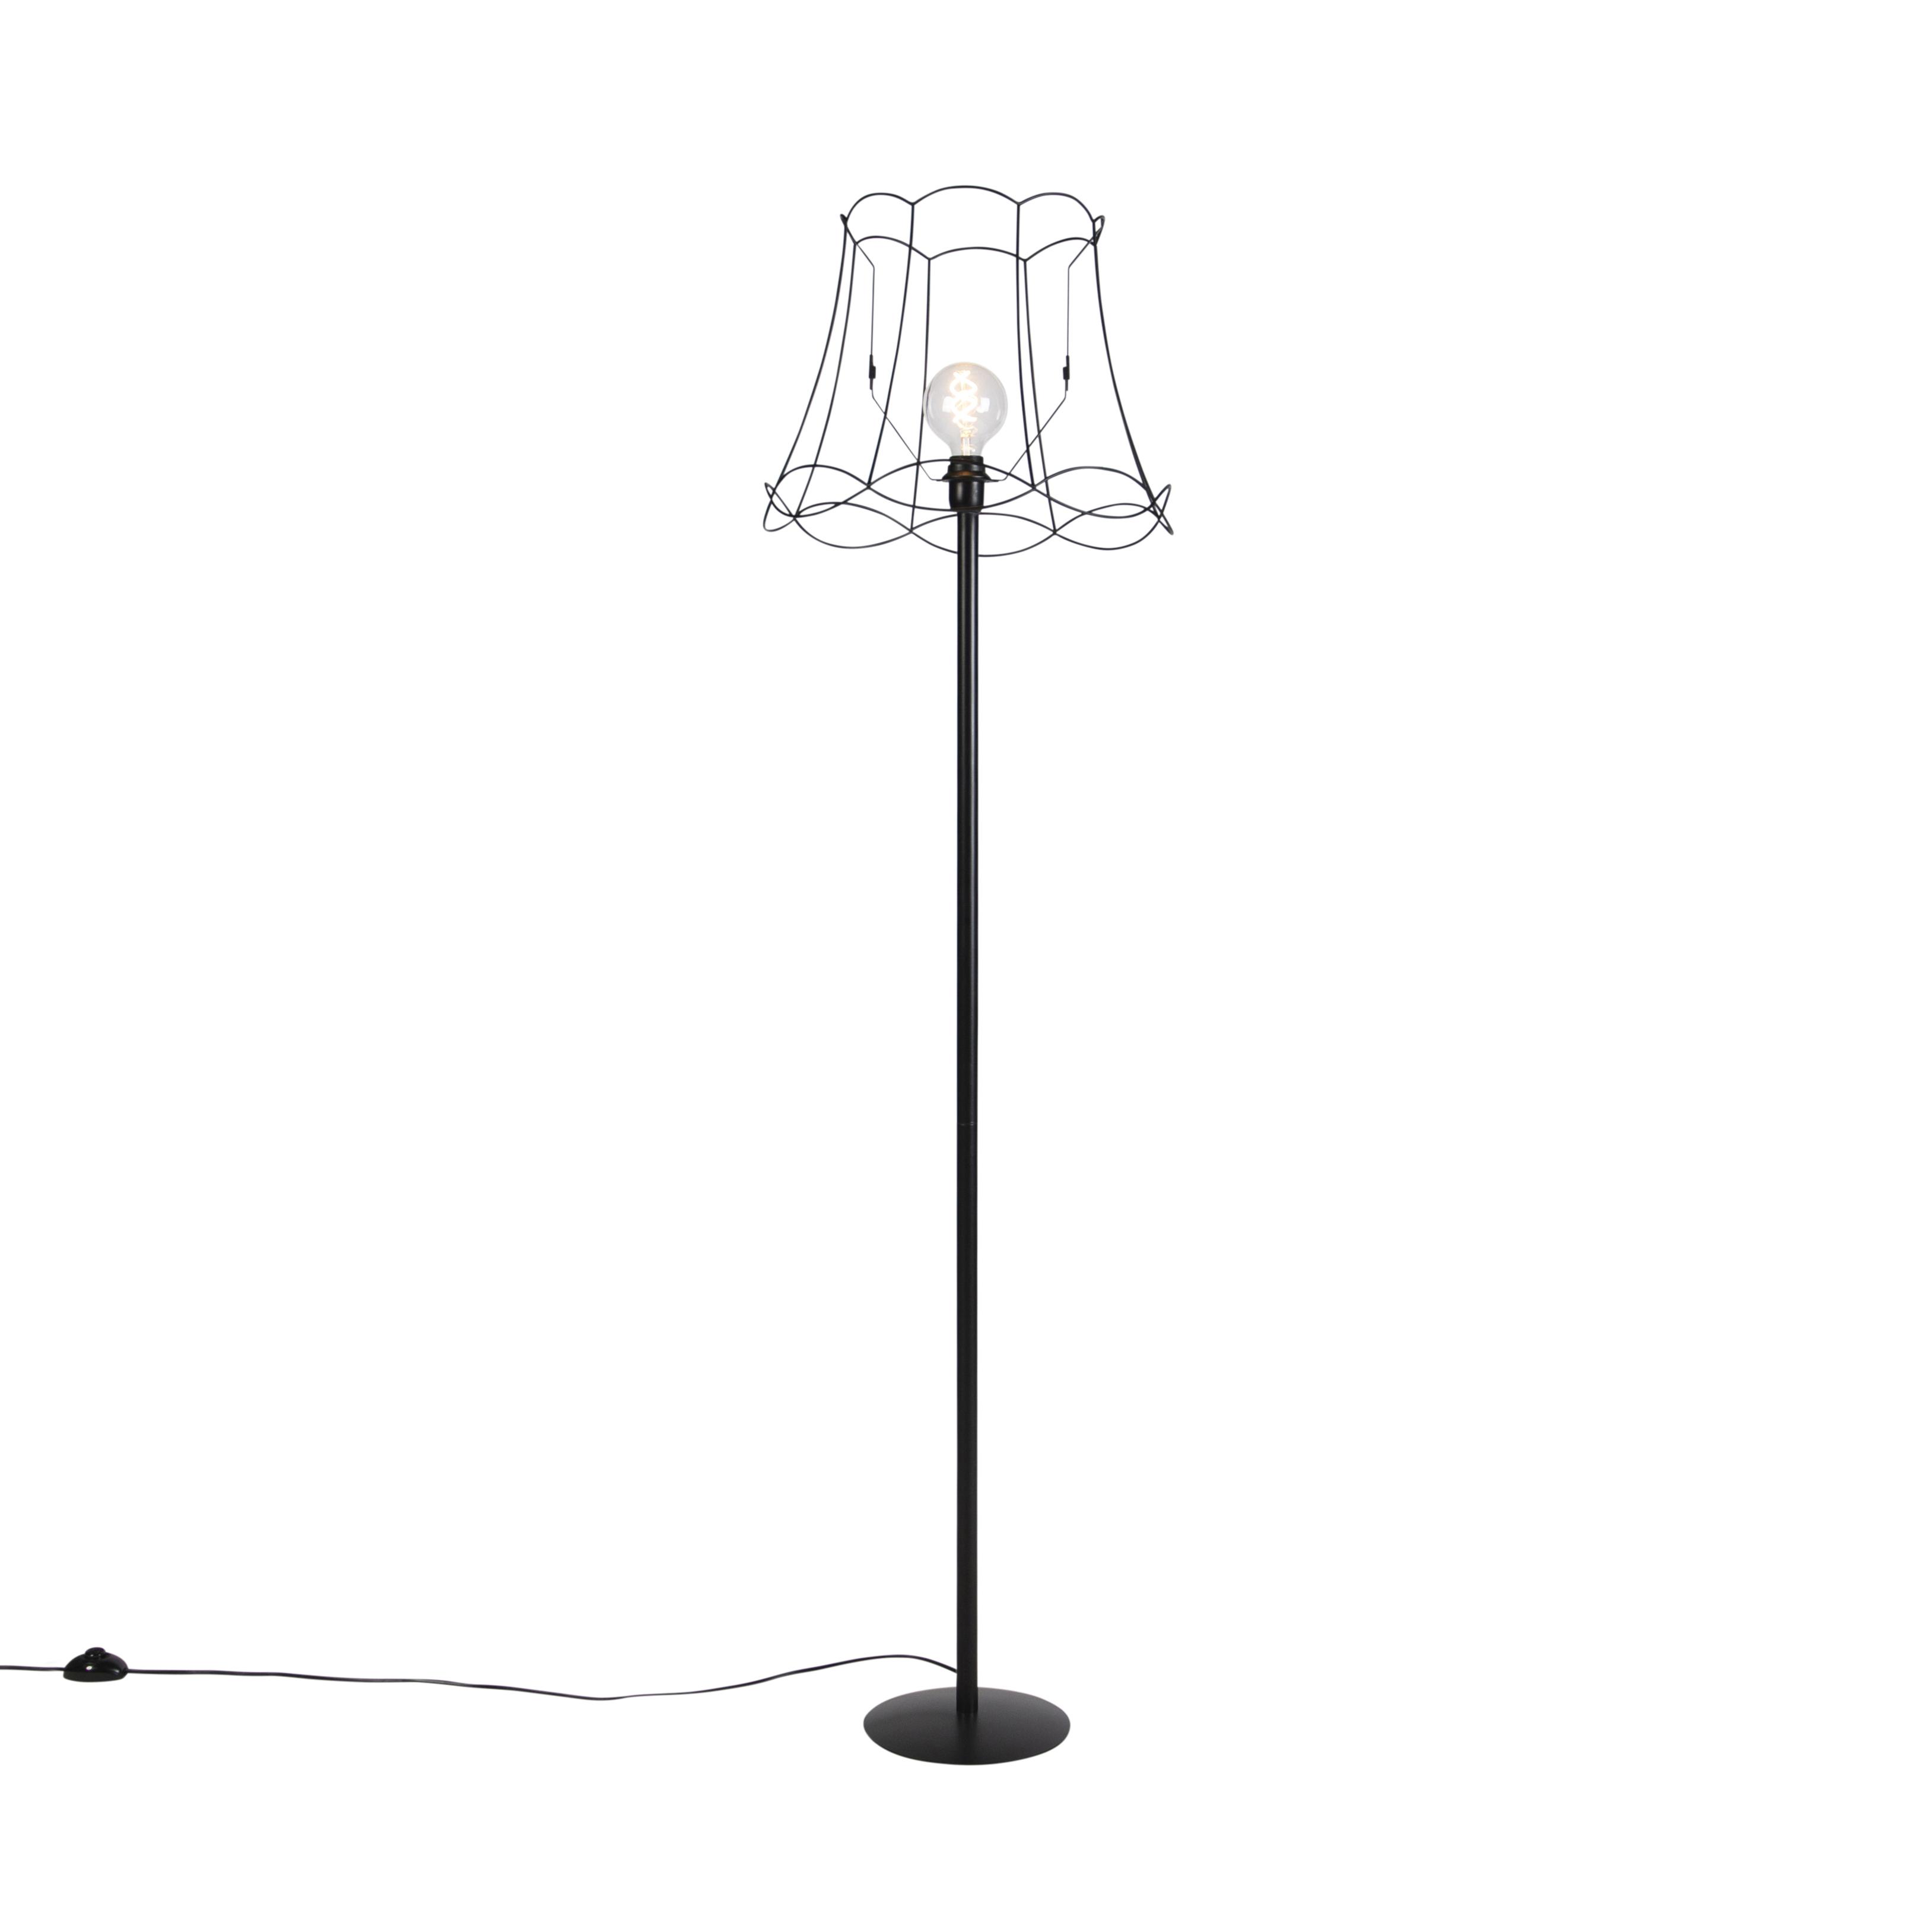 Zwarte vloerlamp met Granny Frame kap zwart 45 cm - Simplo